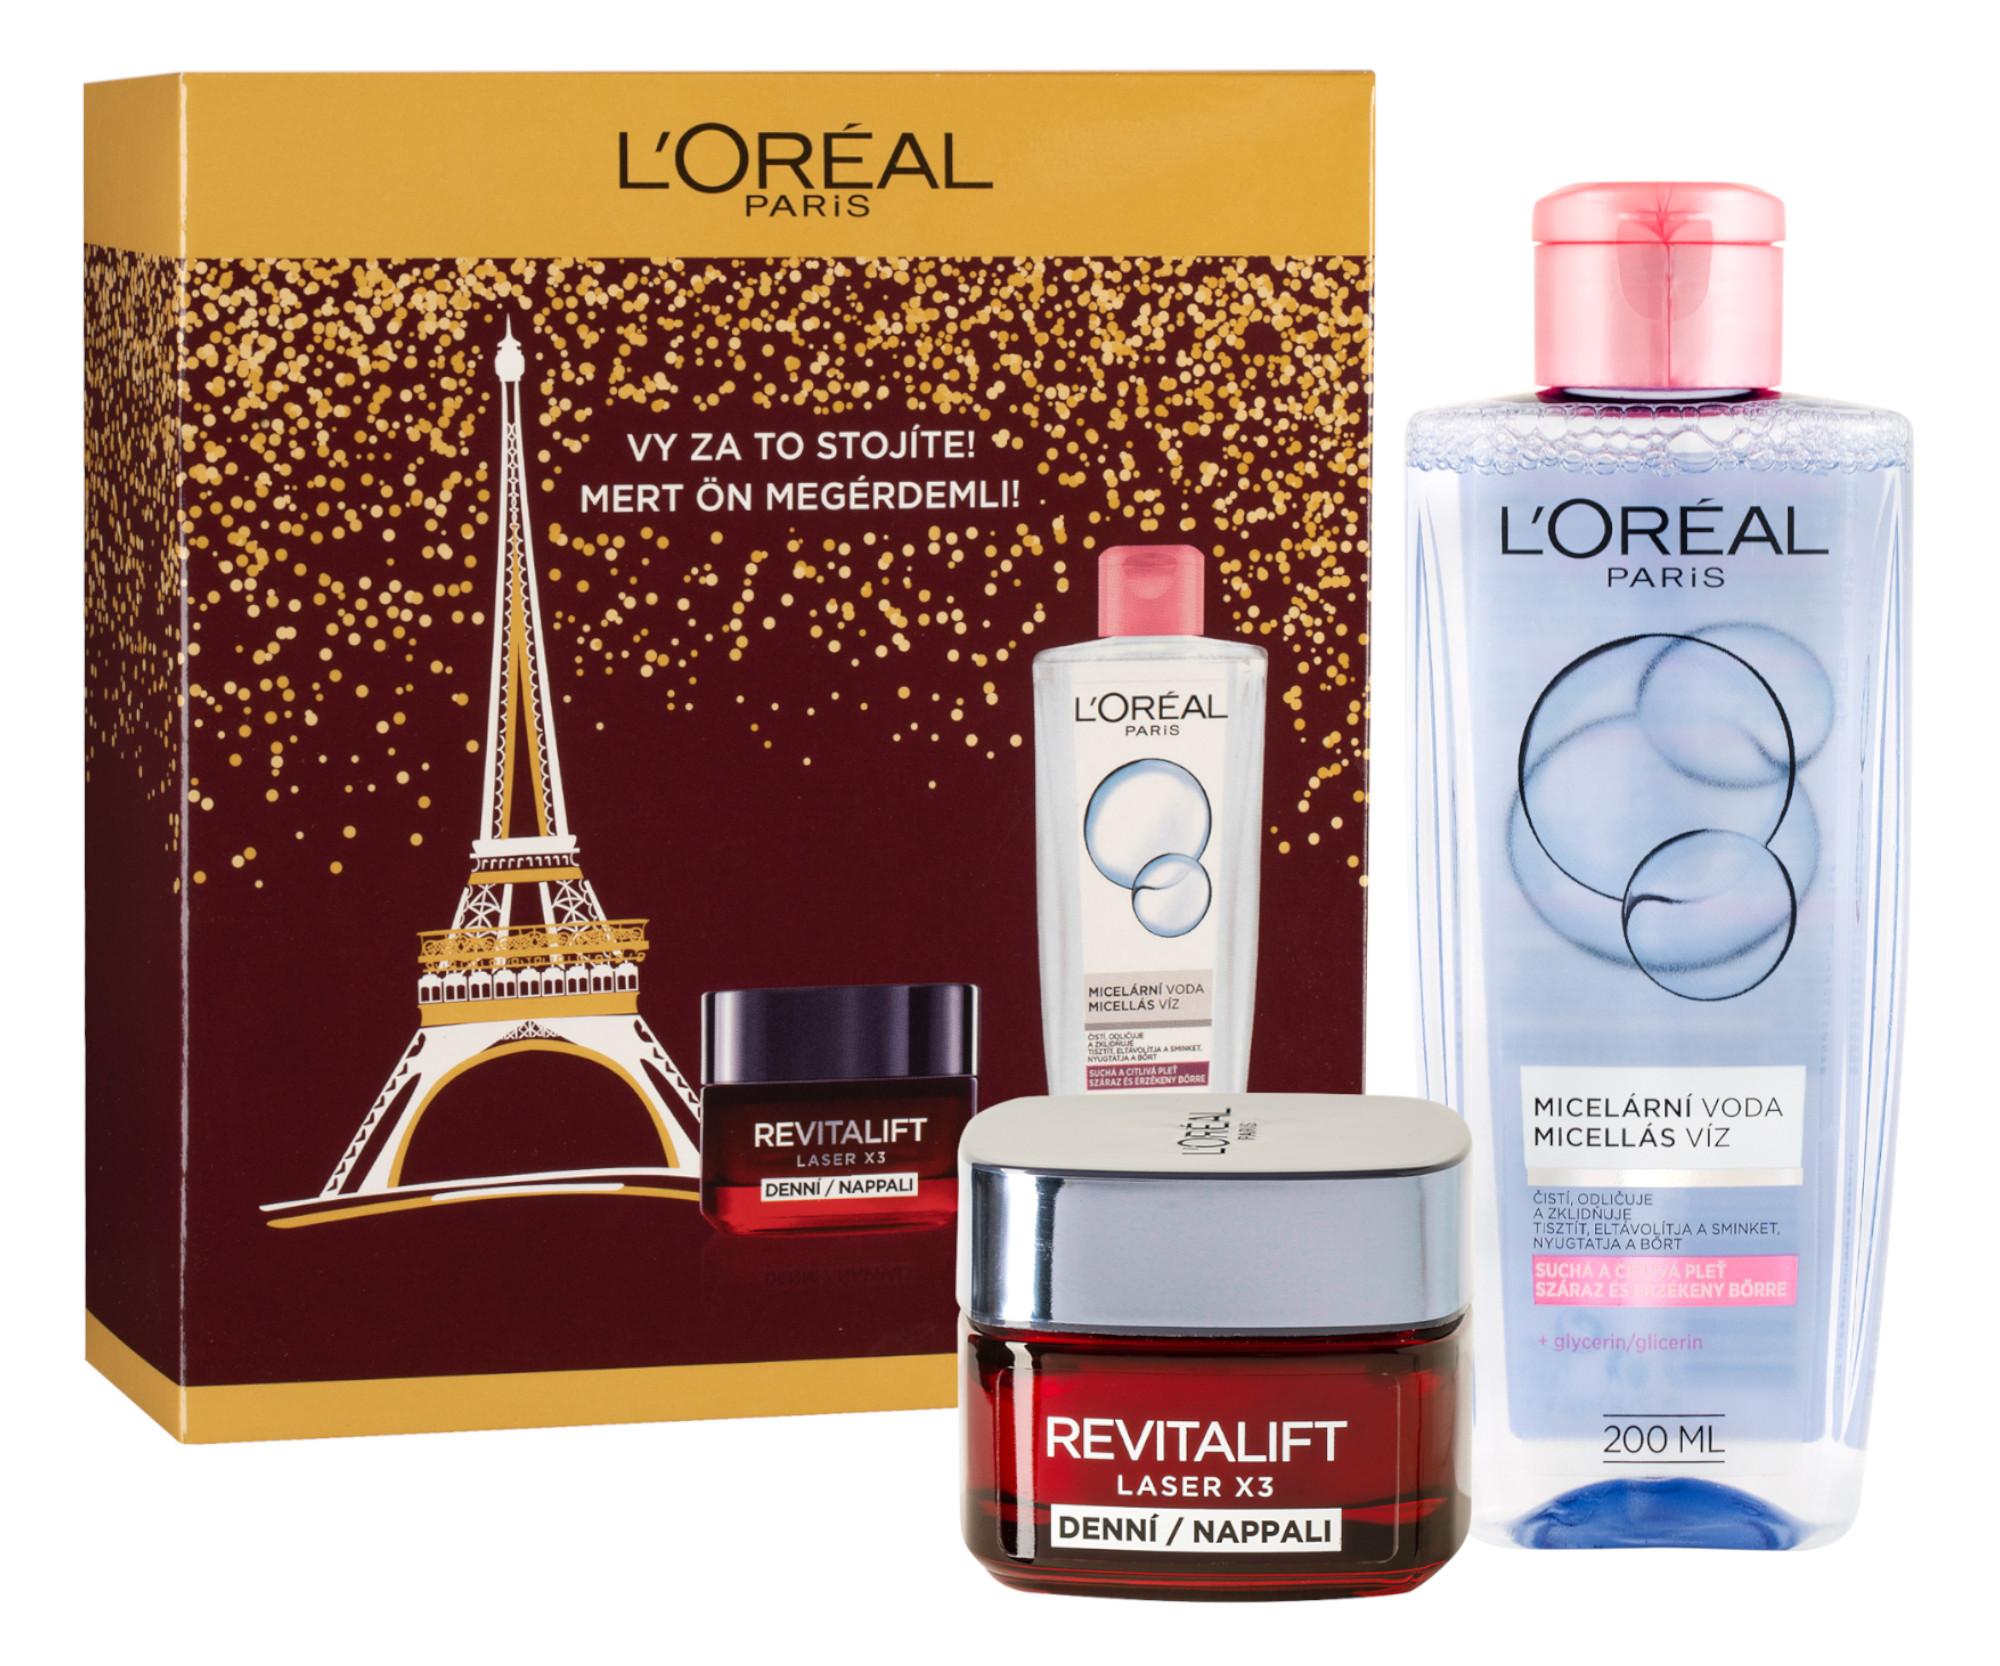 Dárková sada Loréal Paris Revitalift Laser X3 - denní krém 50 ml + micelární voda 200 ml - L'Oréal Paris + DÁREK ZDARMA